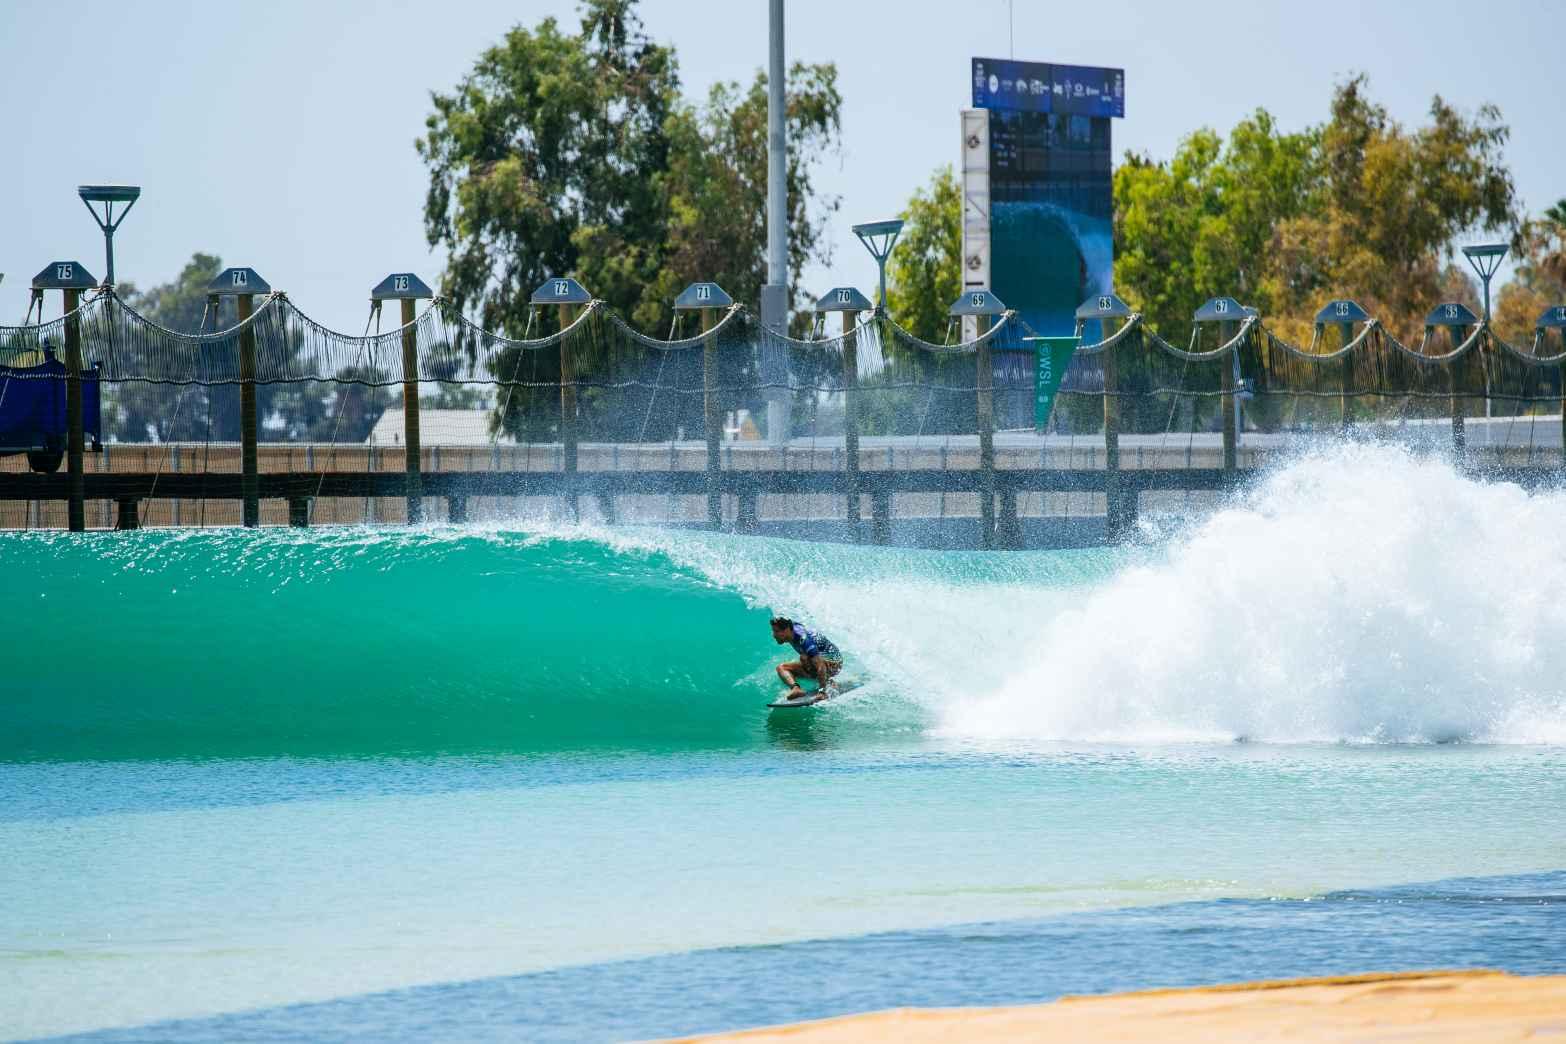 surf30 surf ranch pro 2021 wsl surf Toledo F Ranch21 Heff 6747